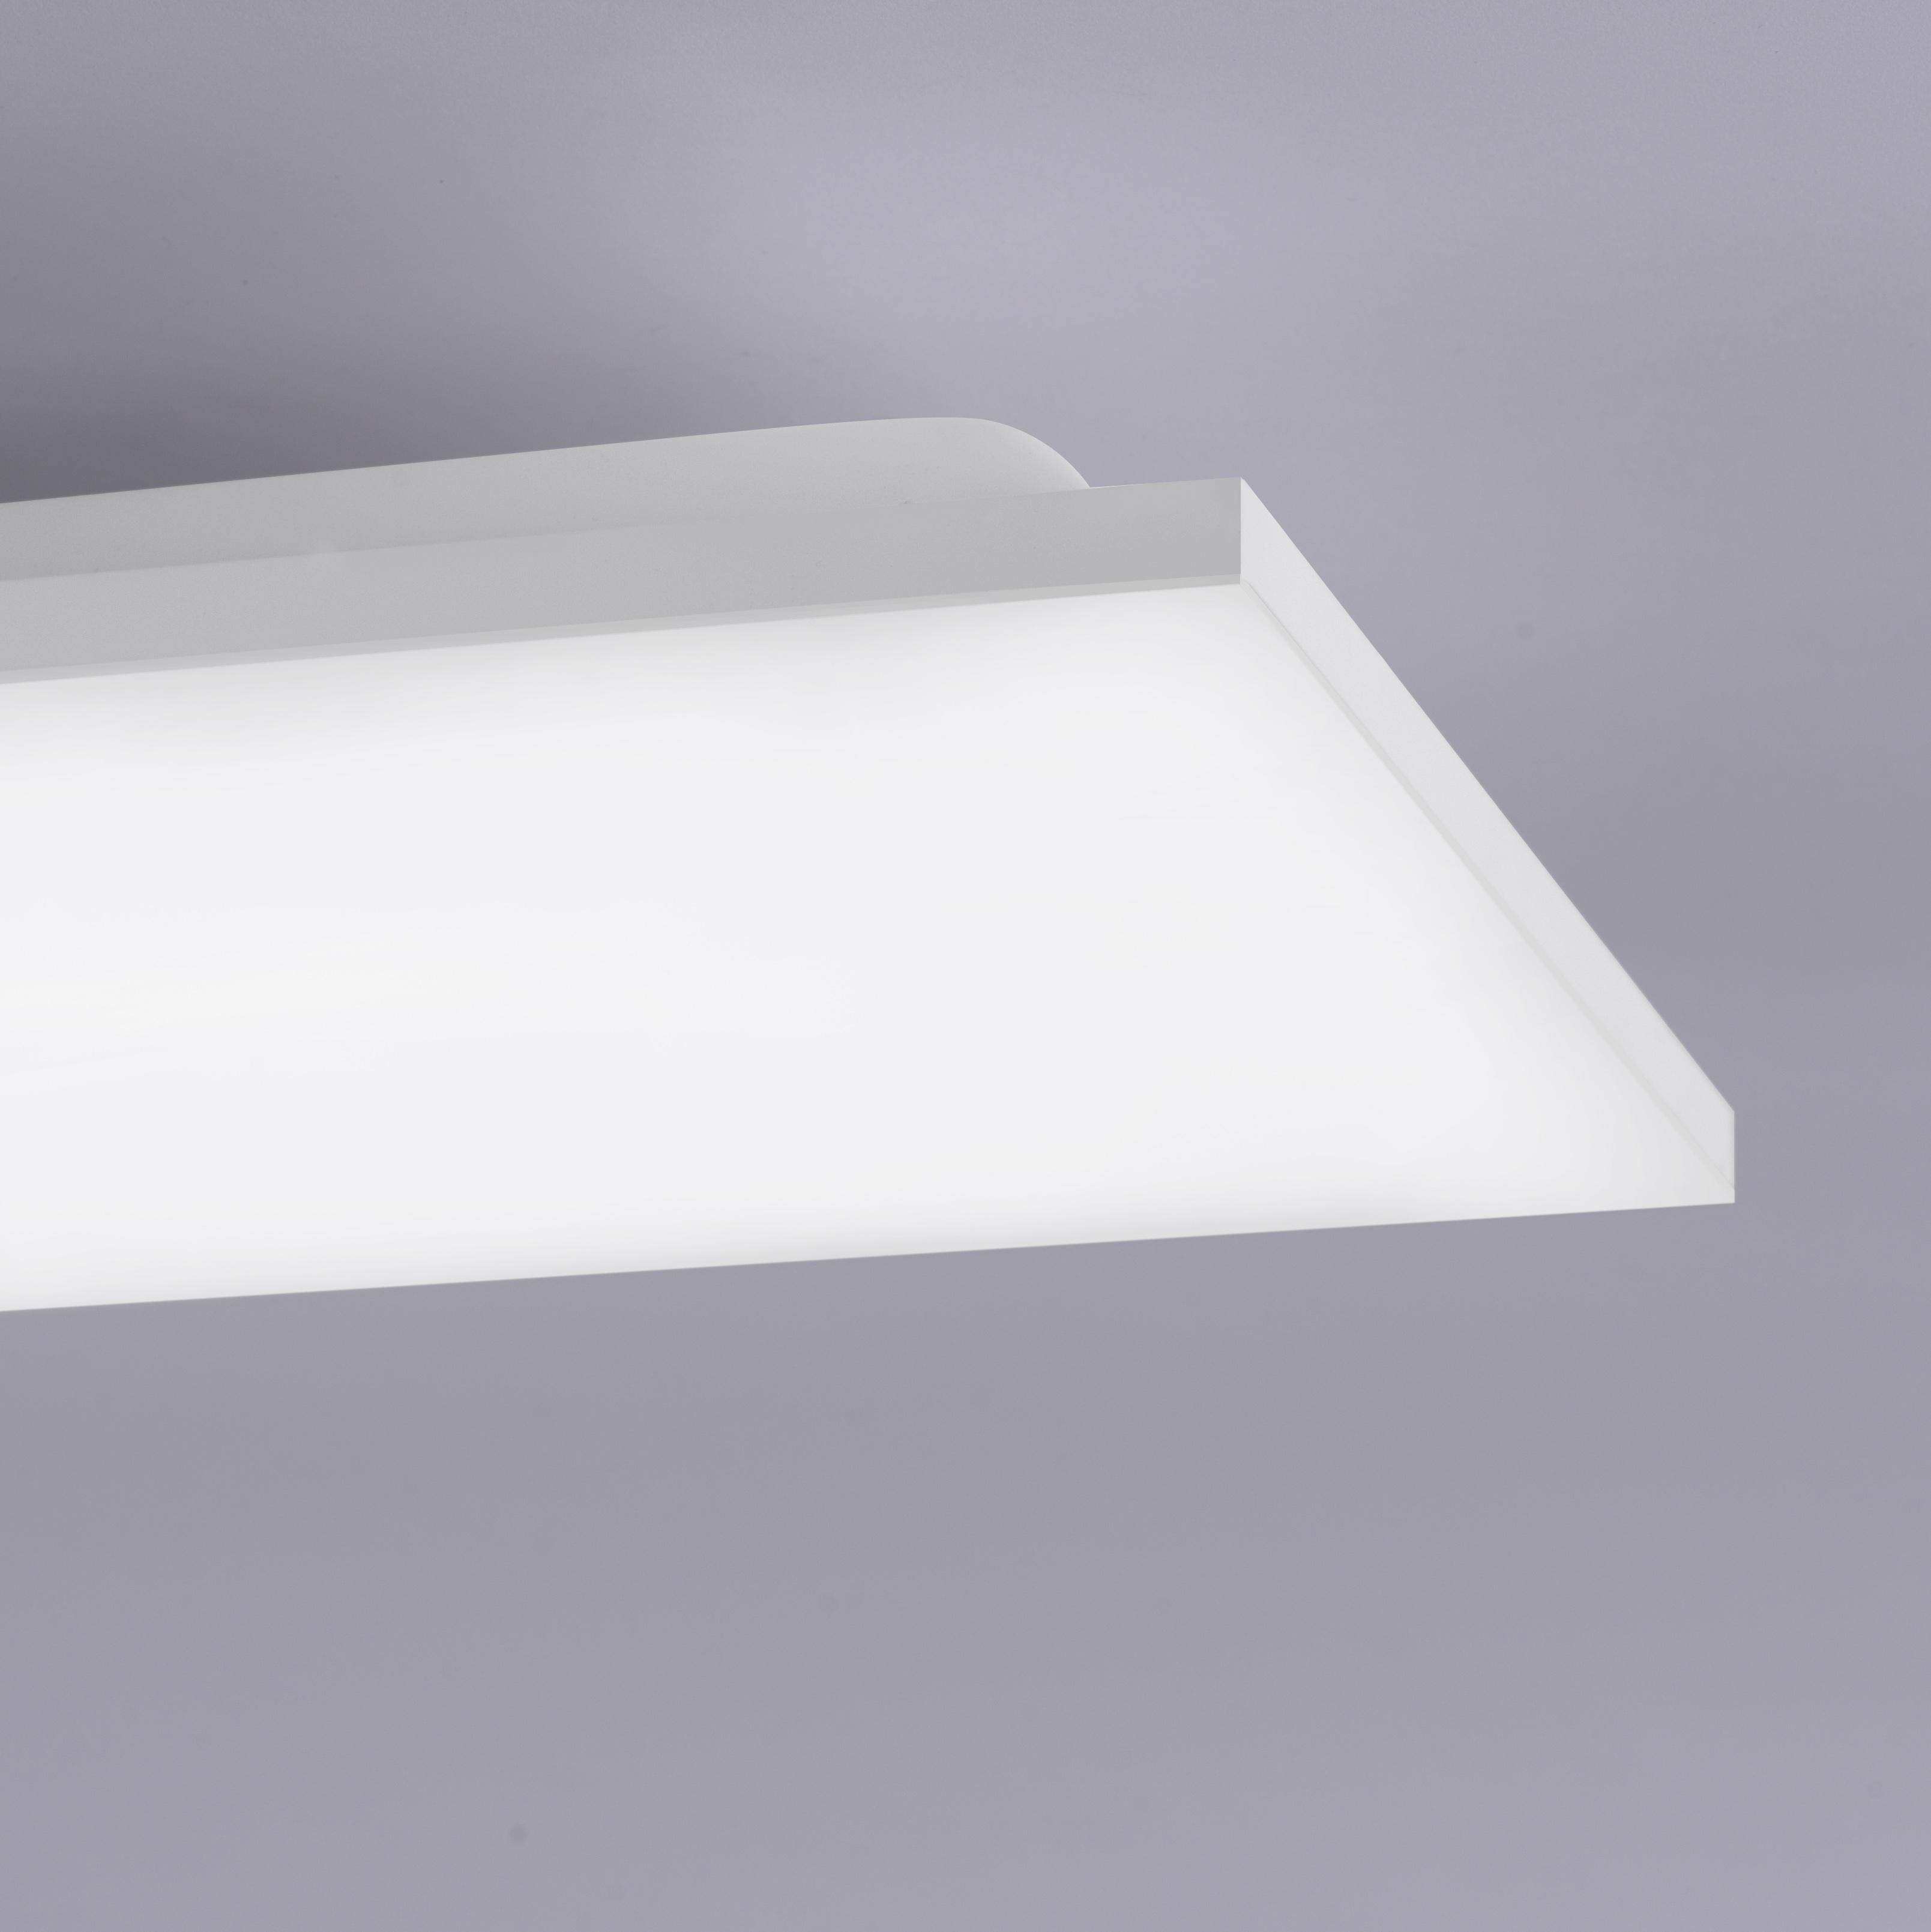 LED Panel, weiß,  rahmenlos, 100x25 cm, CCT Steuerung